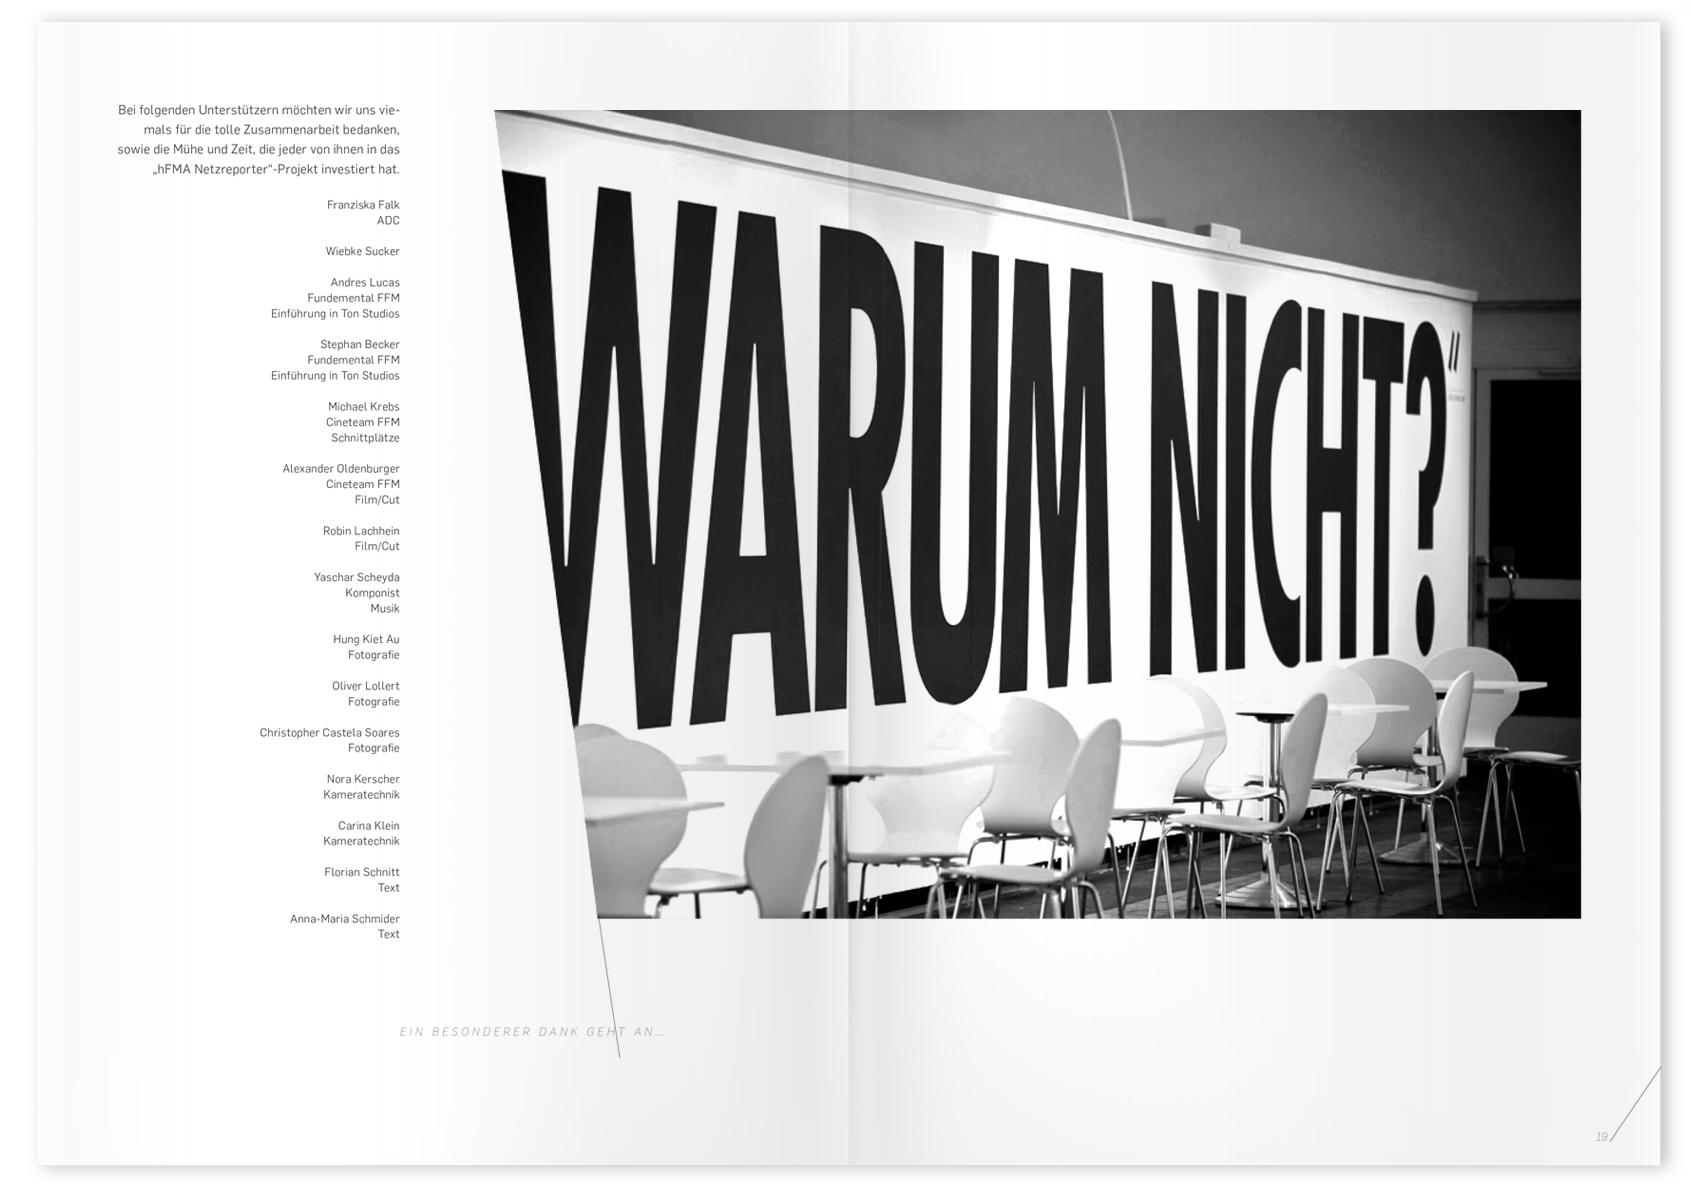 09_hFMA Netzreporter_ADC Festival_Editorial Design_Grafikdesign_Gloria Kison.jpg